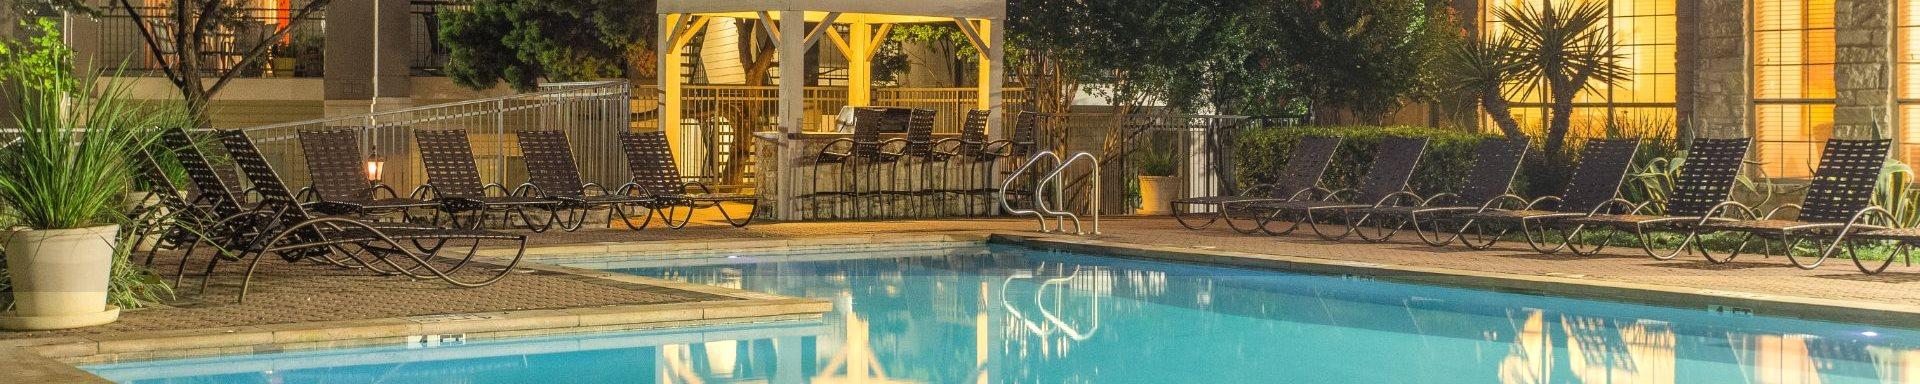 Glimmering Pool at San Marin, Austin, Texas